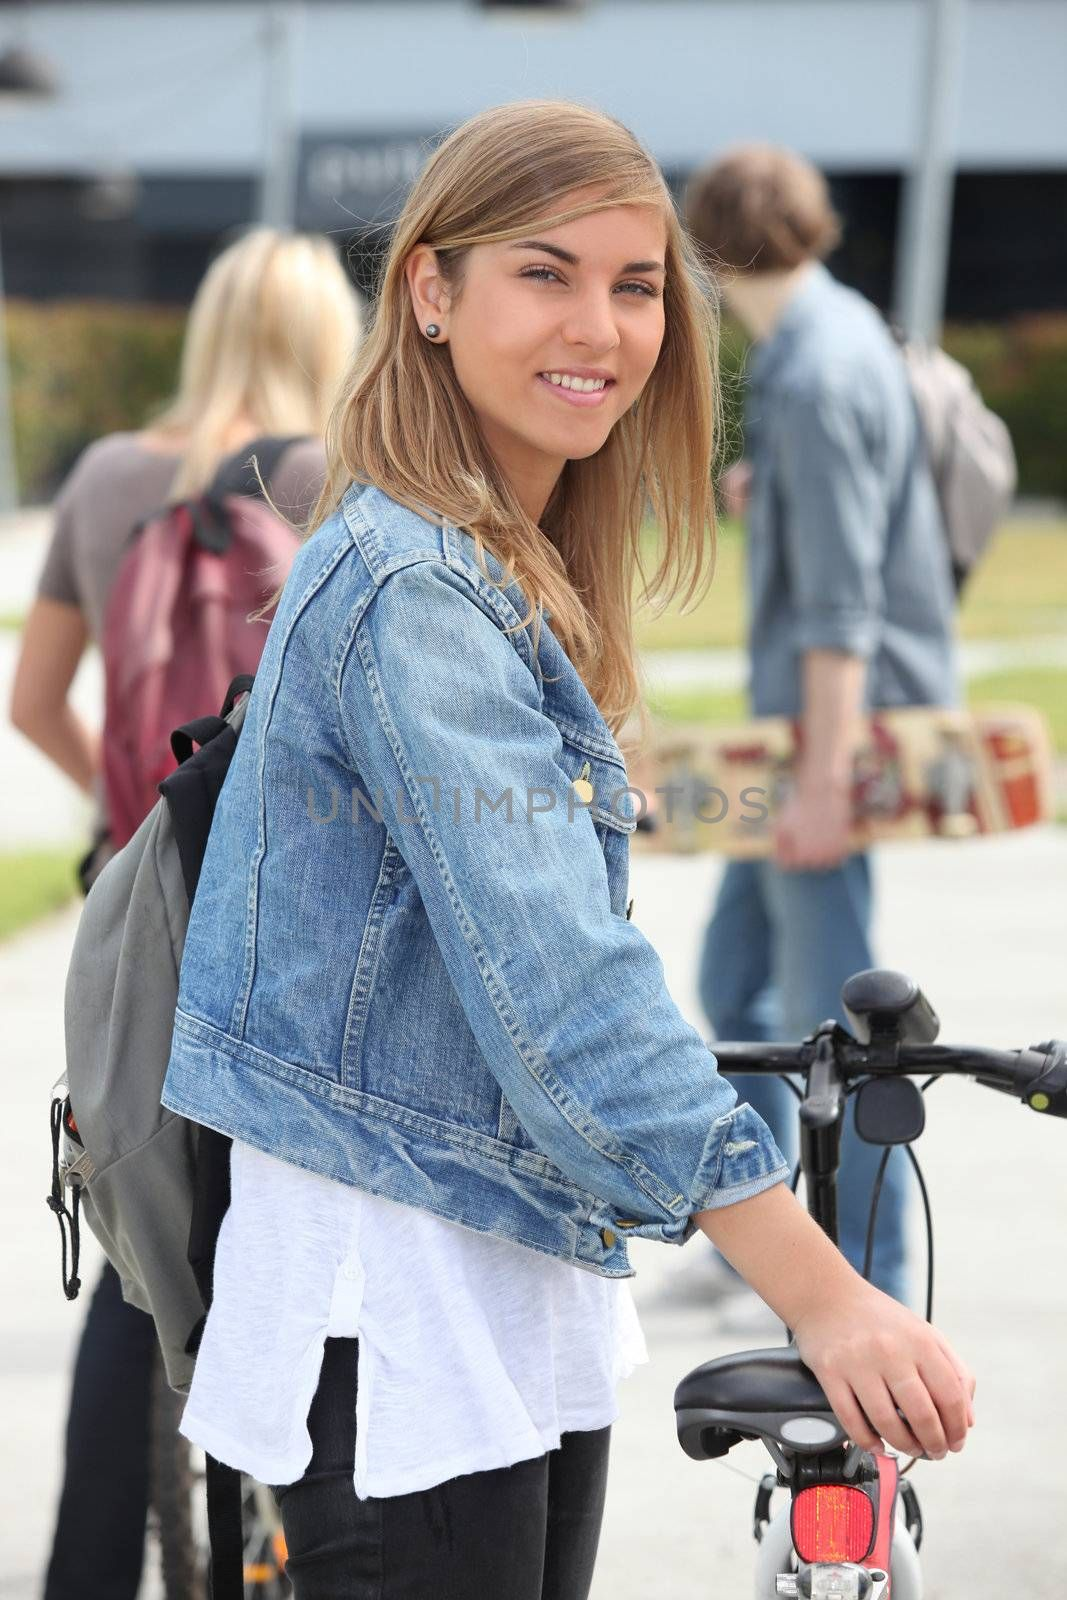 Smiling teenage girl with bicycle